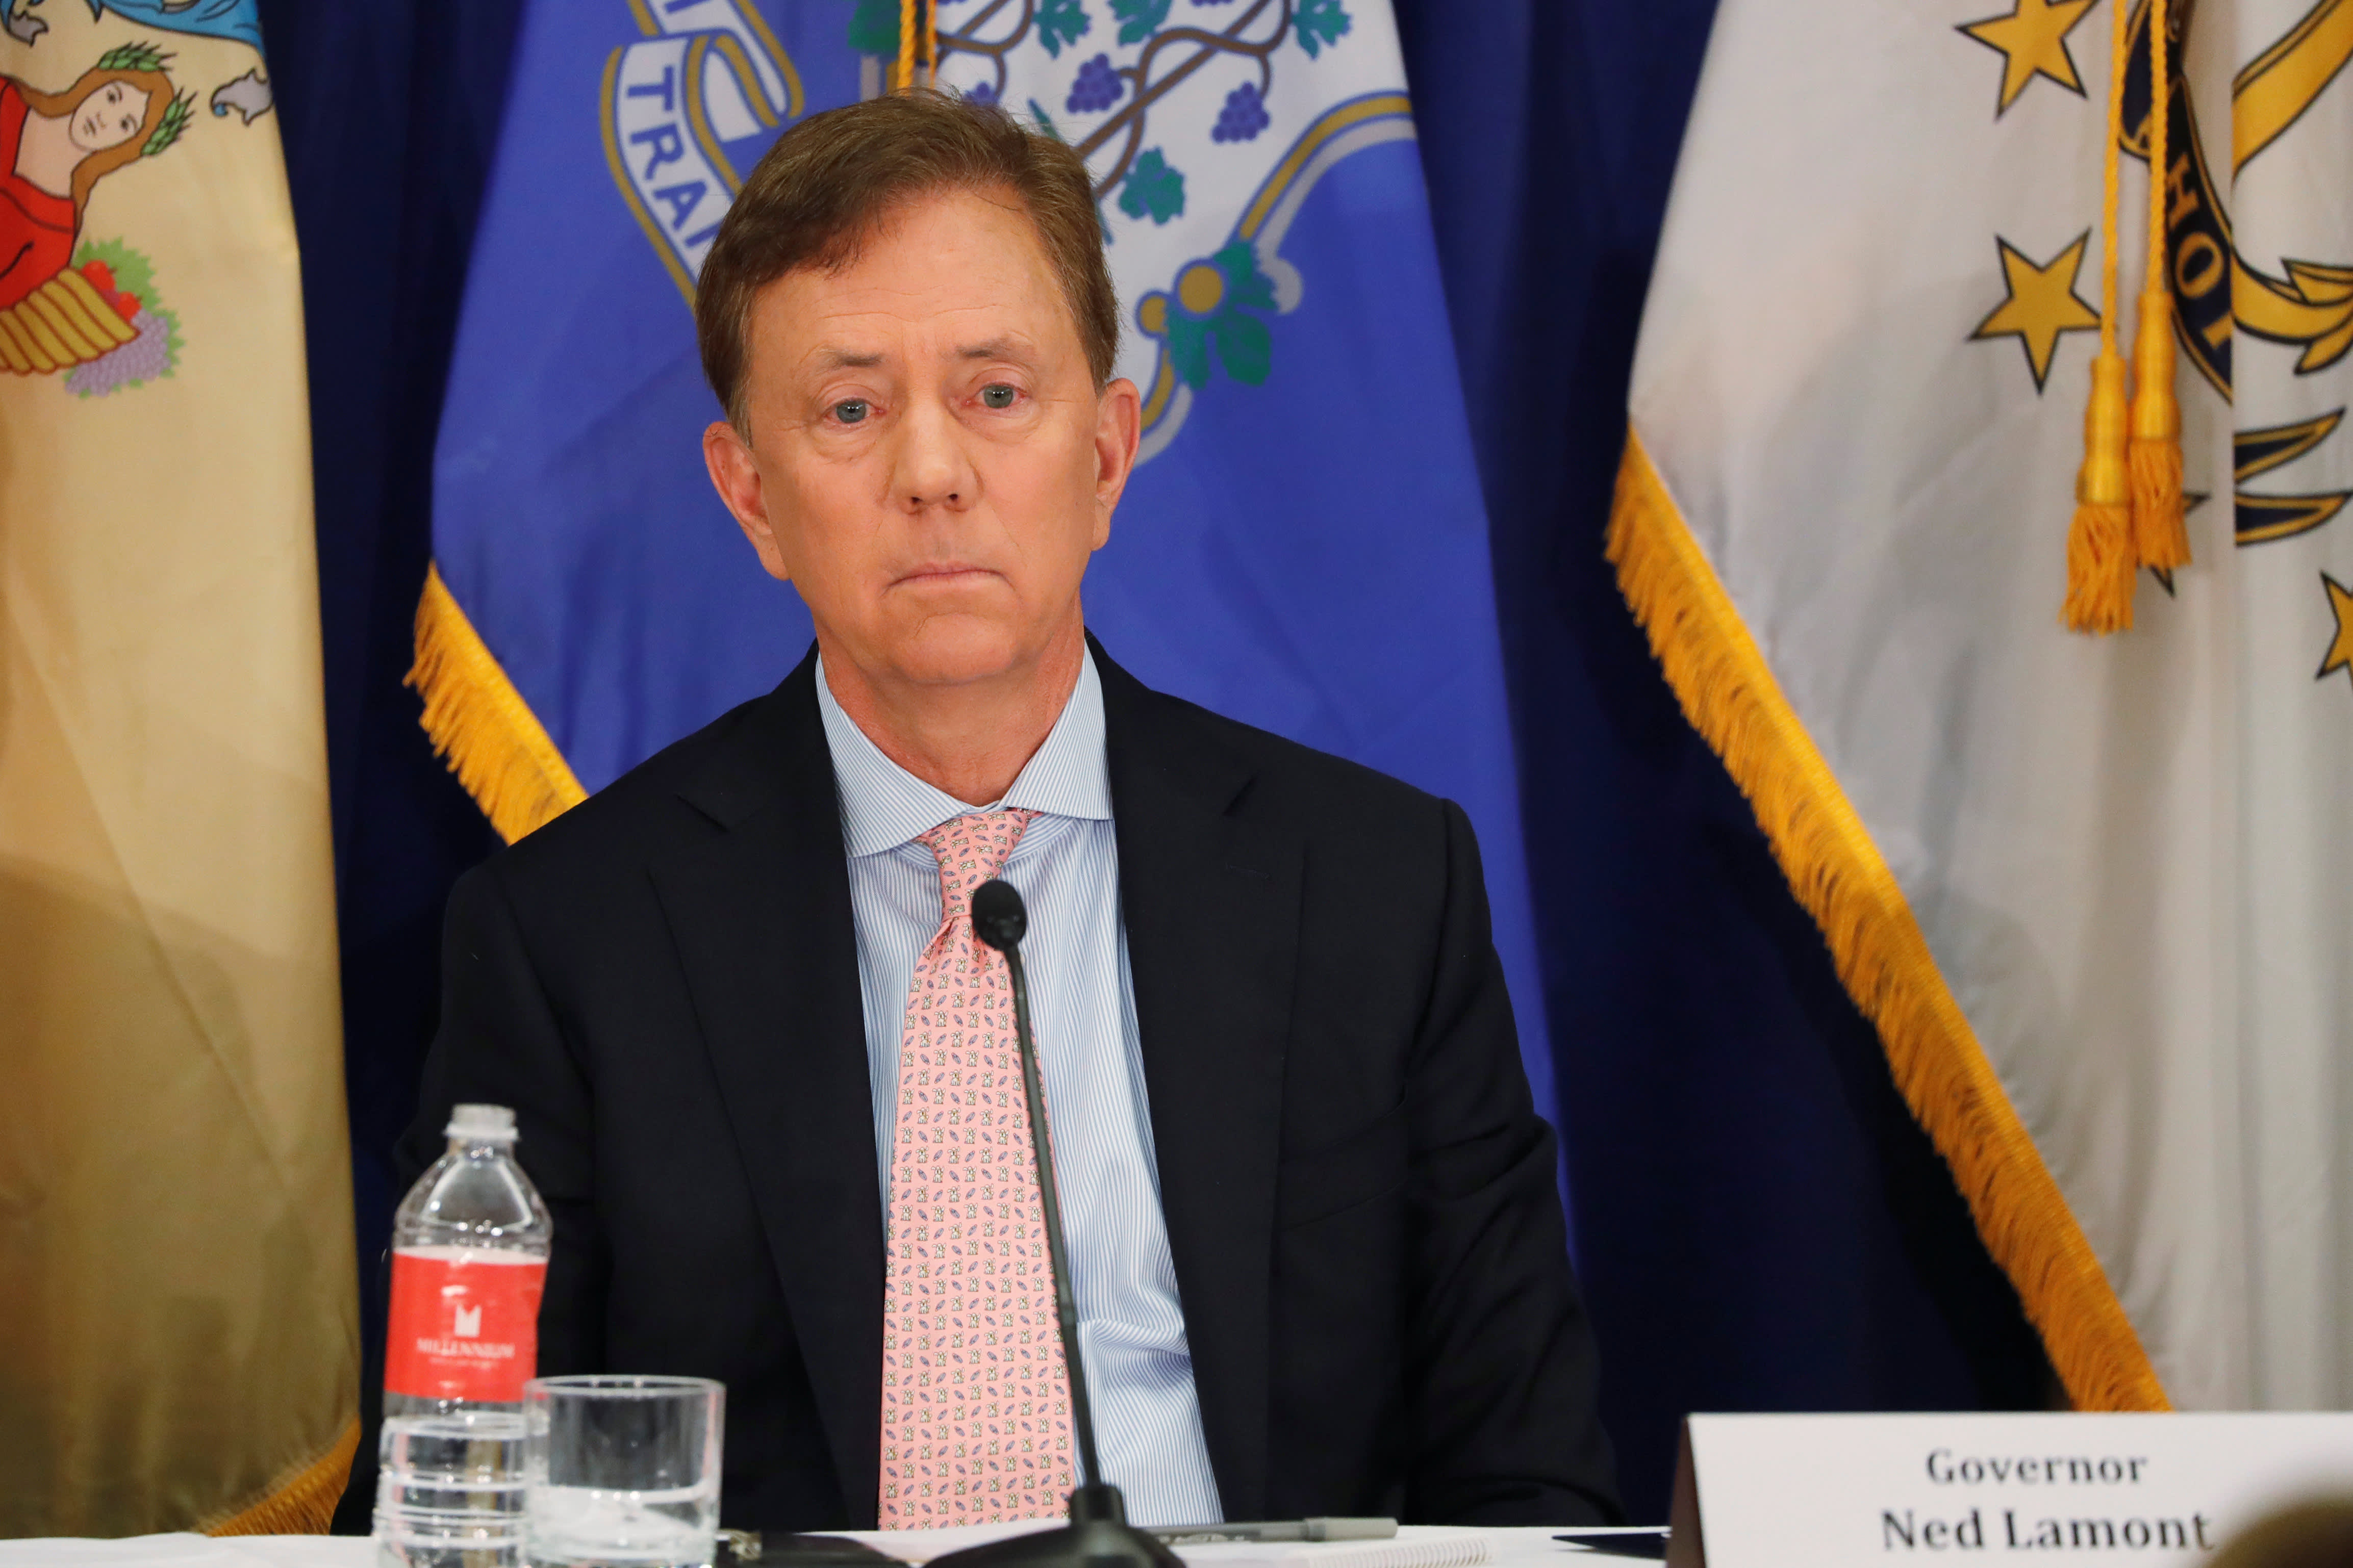 Connecticut Gov. Ned Lamont on beds, ventilators for coronavirus